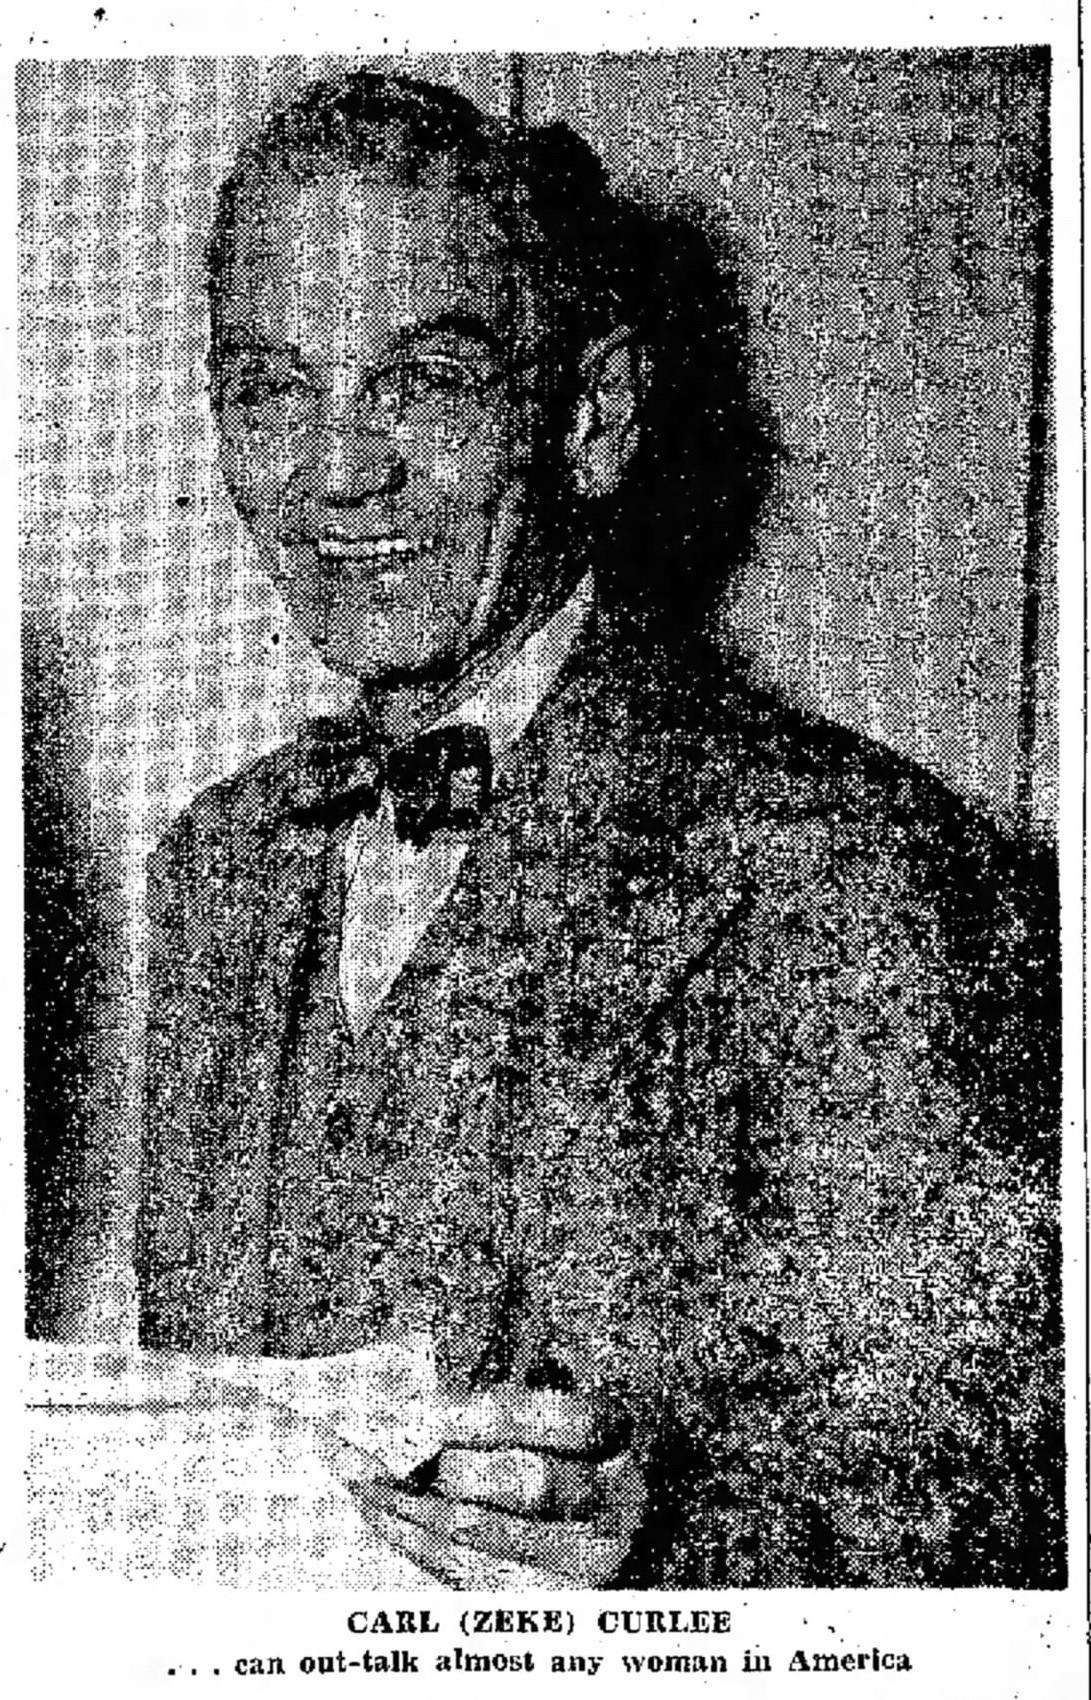 Carl Benjiman 'Zeke' Curlee